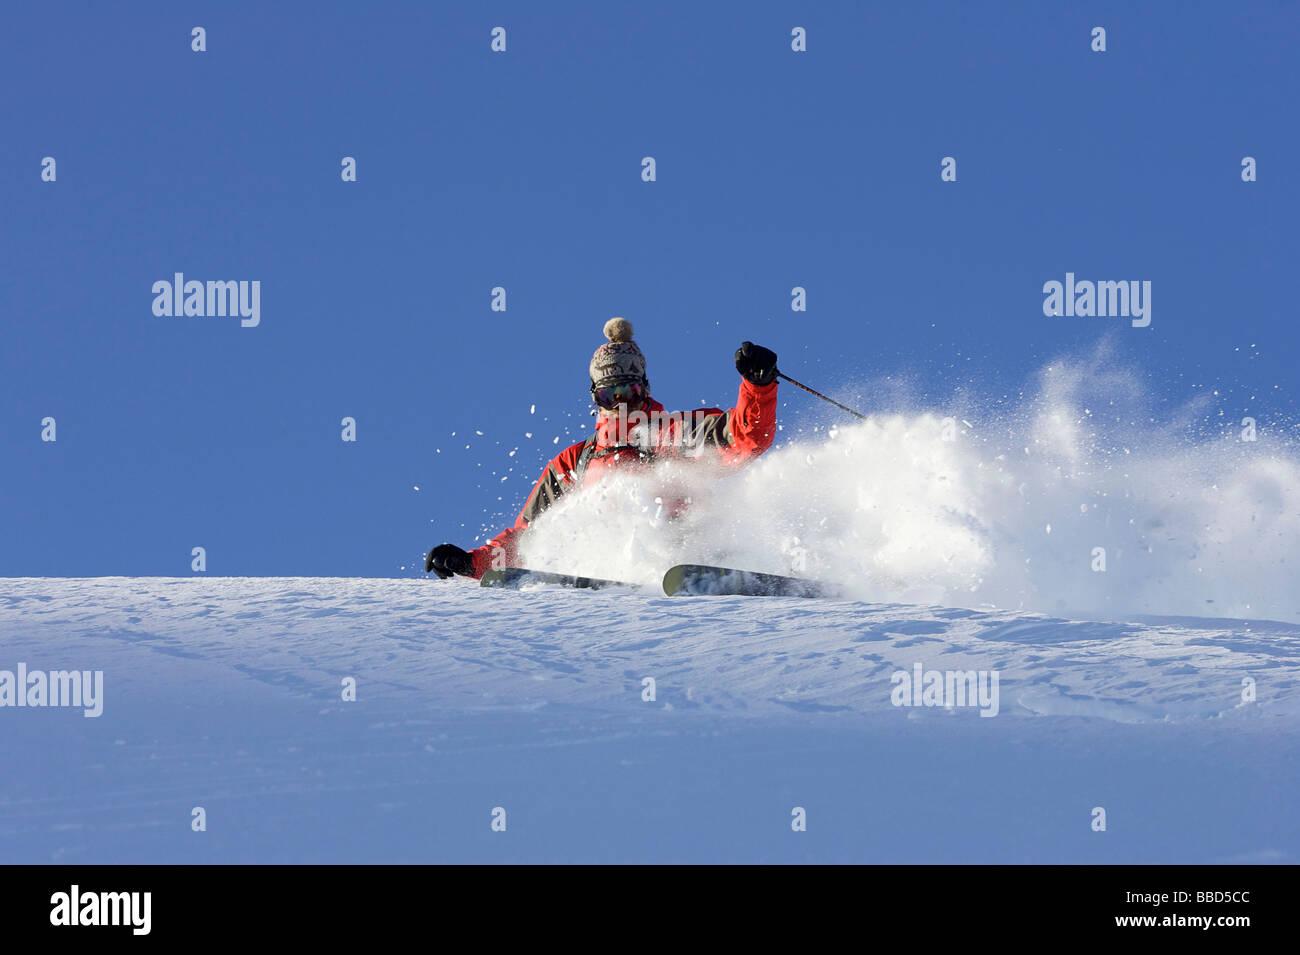 Skier turning off piste. - Stock Image